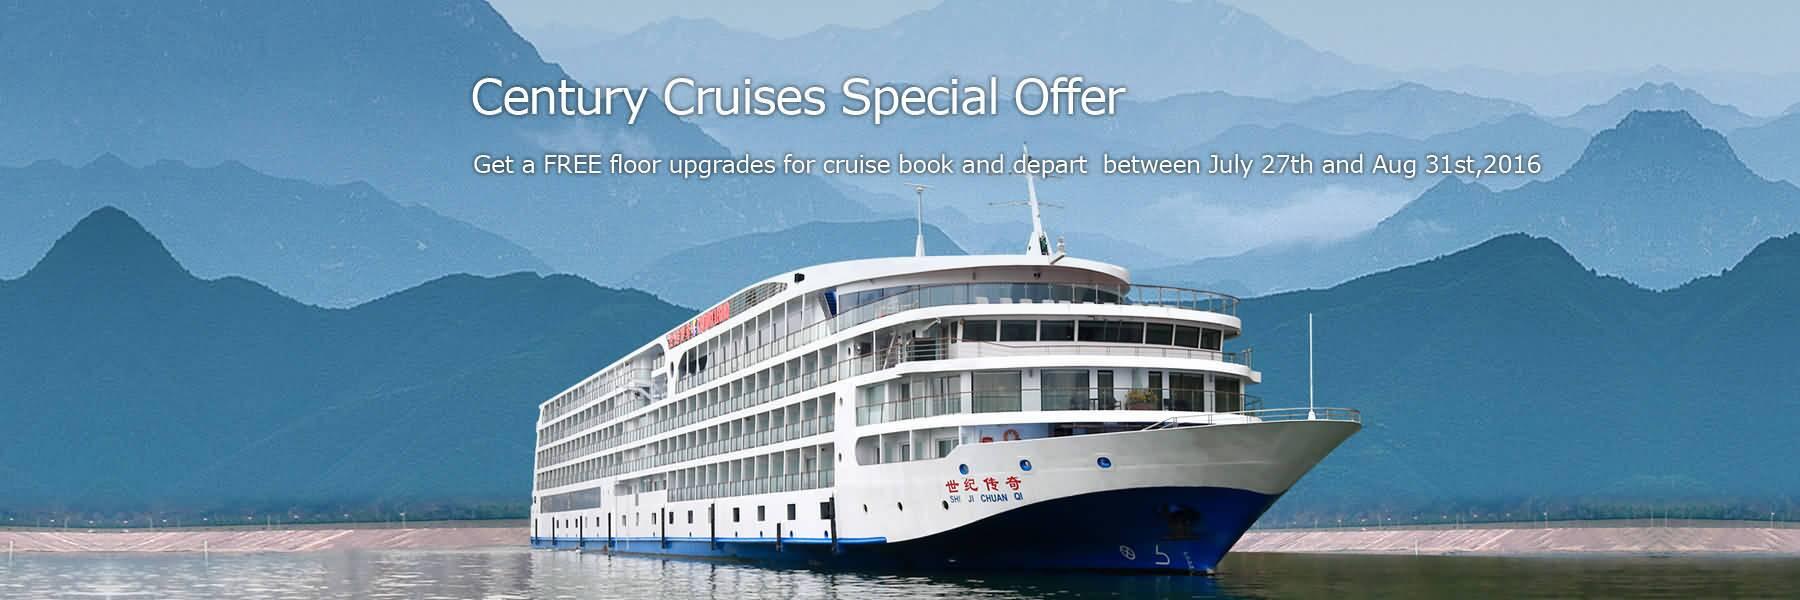 2016 Century Cruises